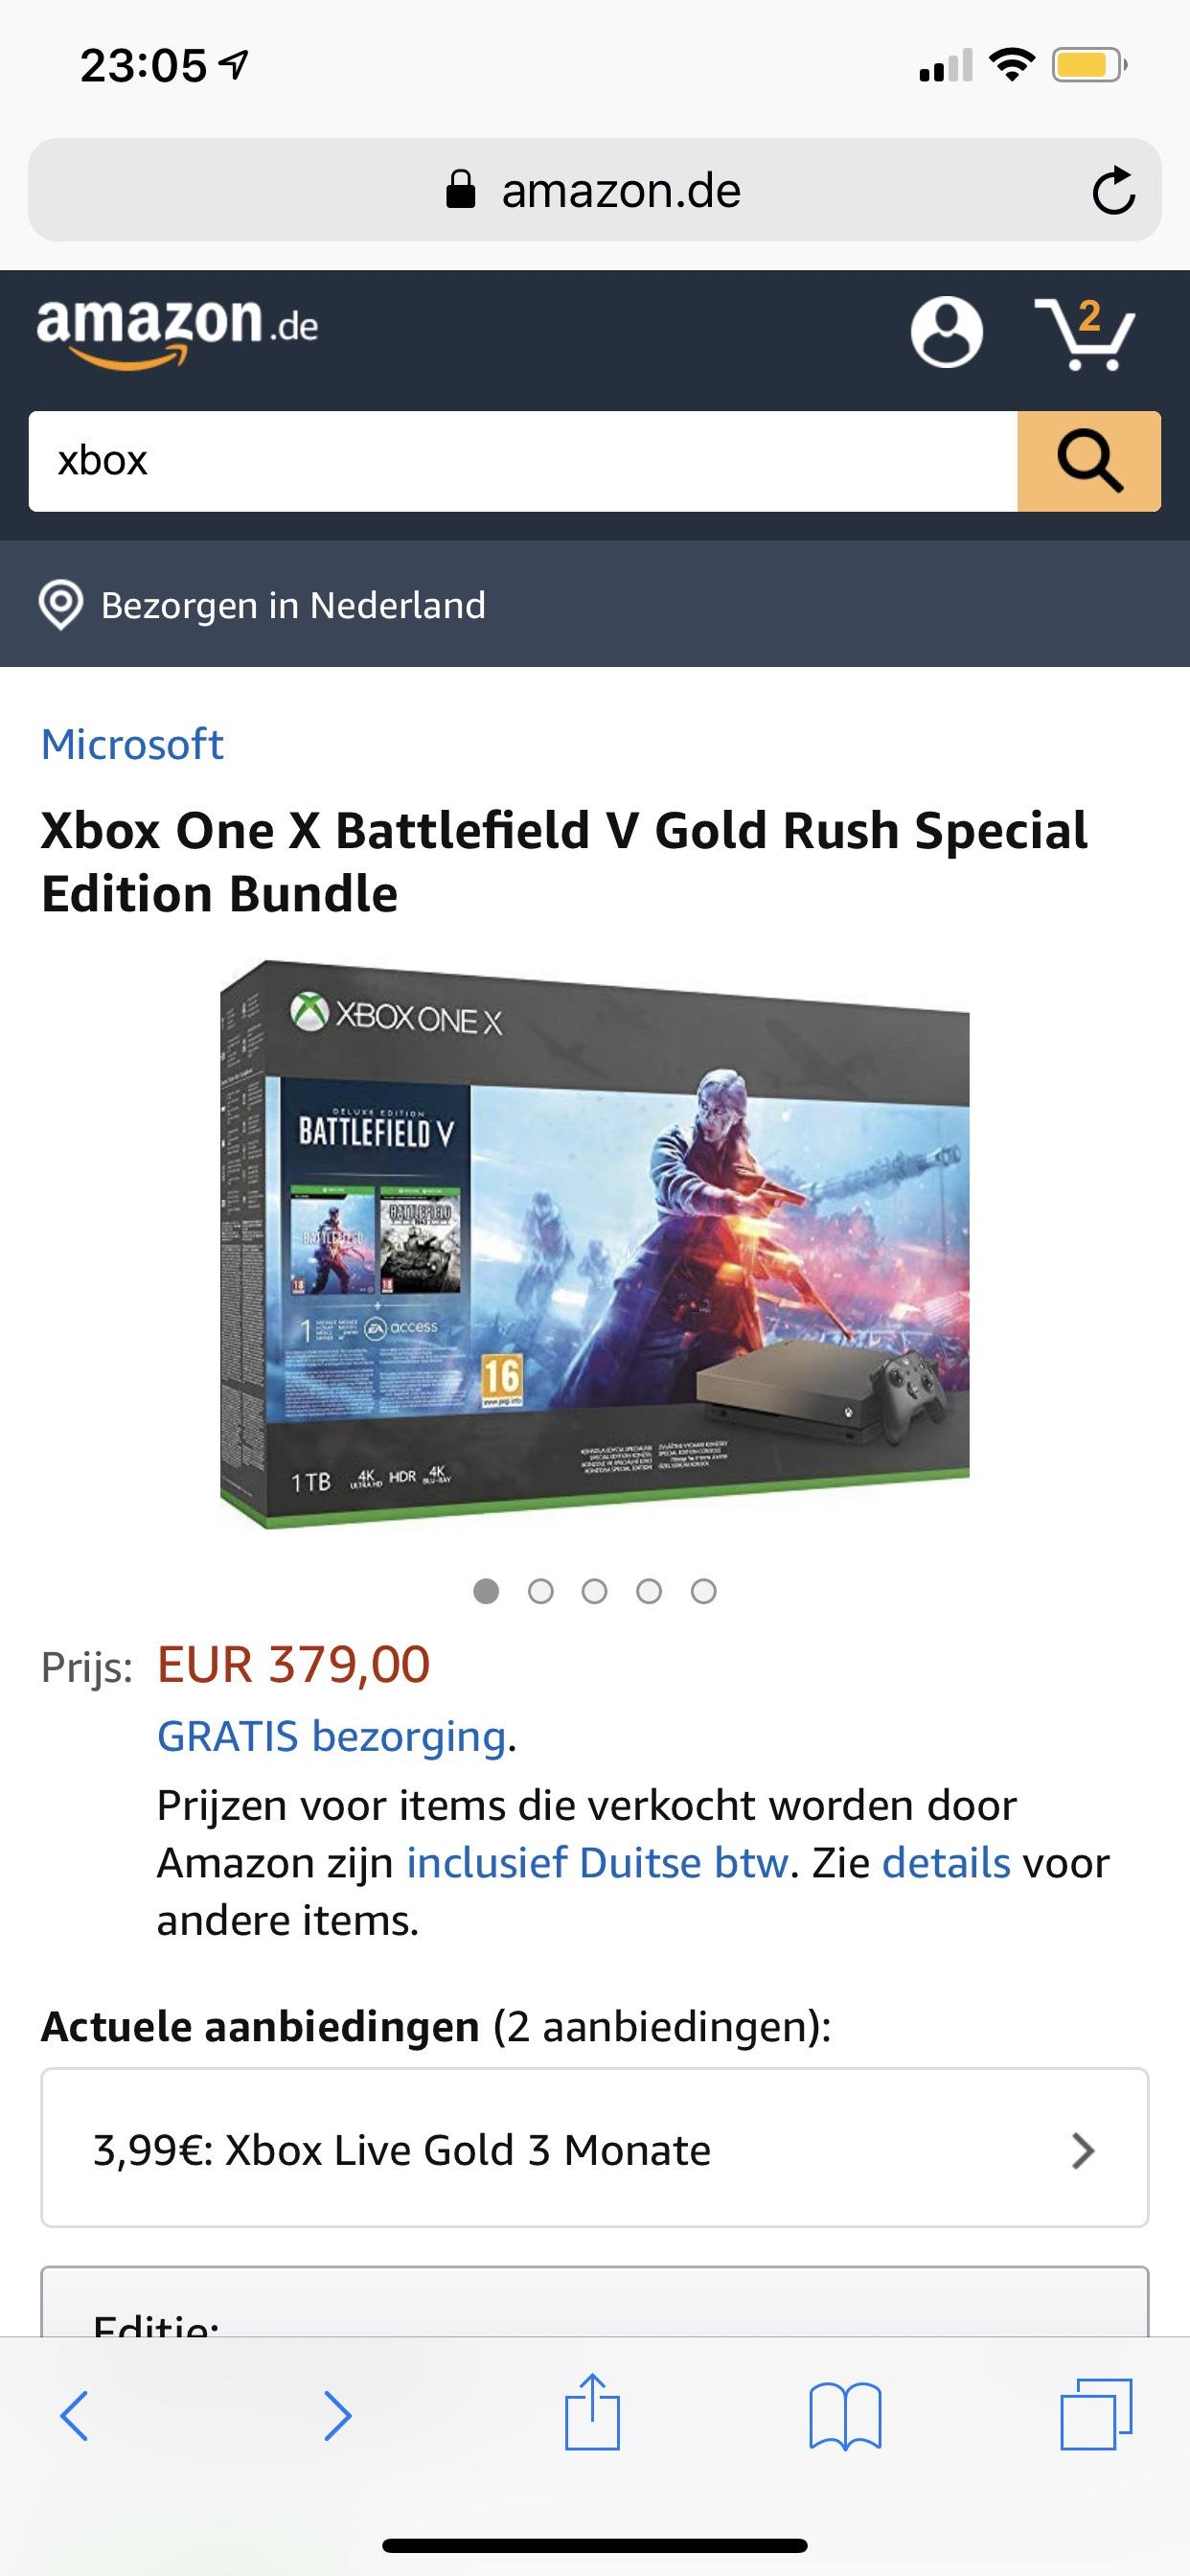 Alle Xbox One X bundels - Amazon de